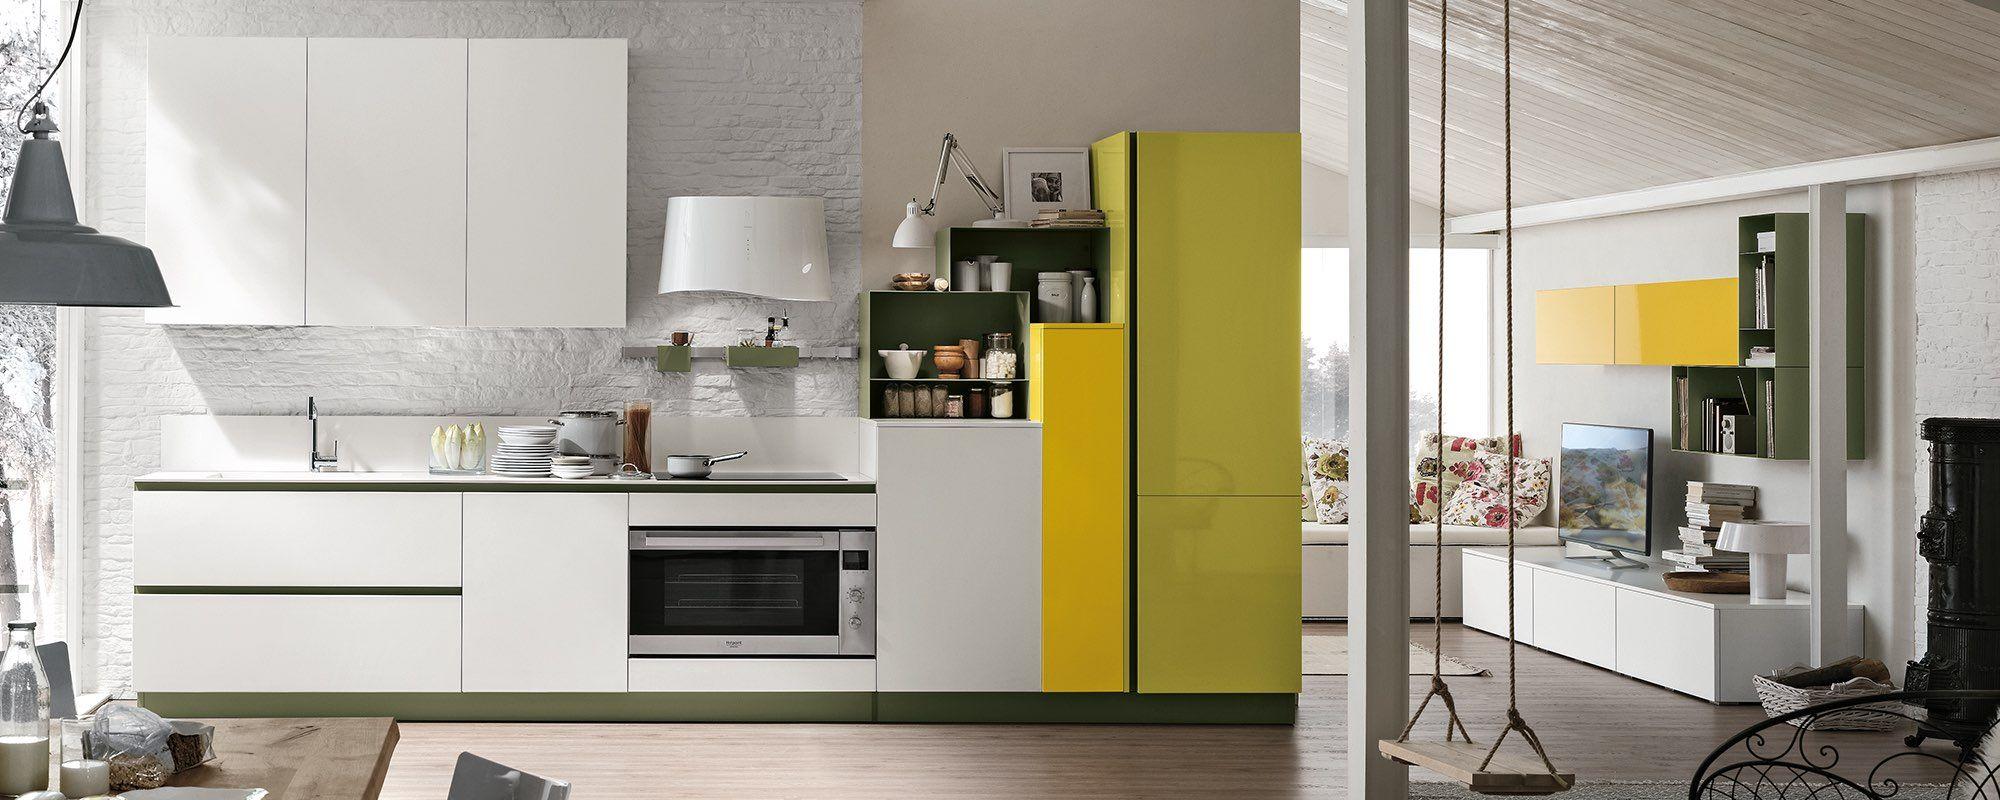 arredamentifelicepalma #felicepalma #arredamenti #cucina #rewind ...